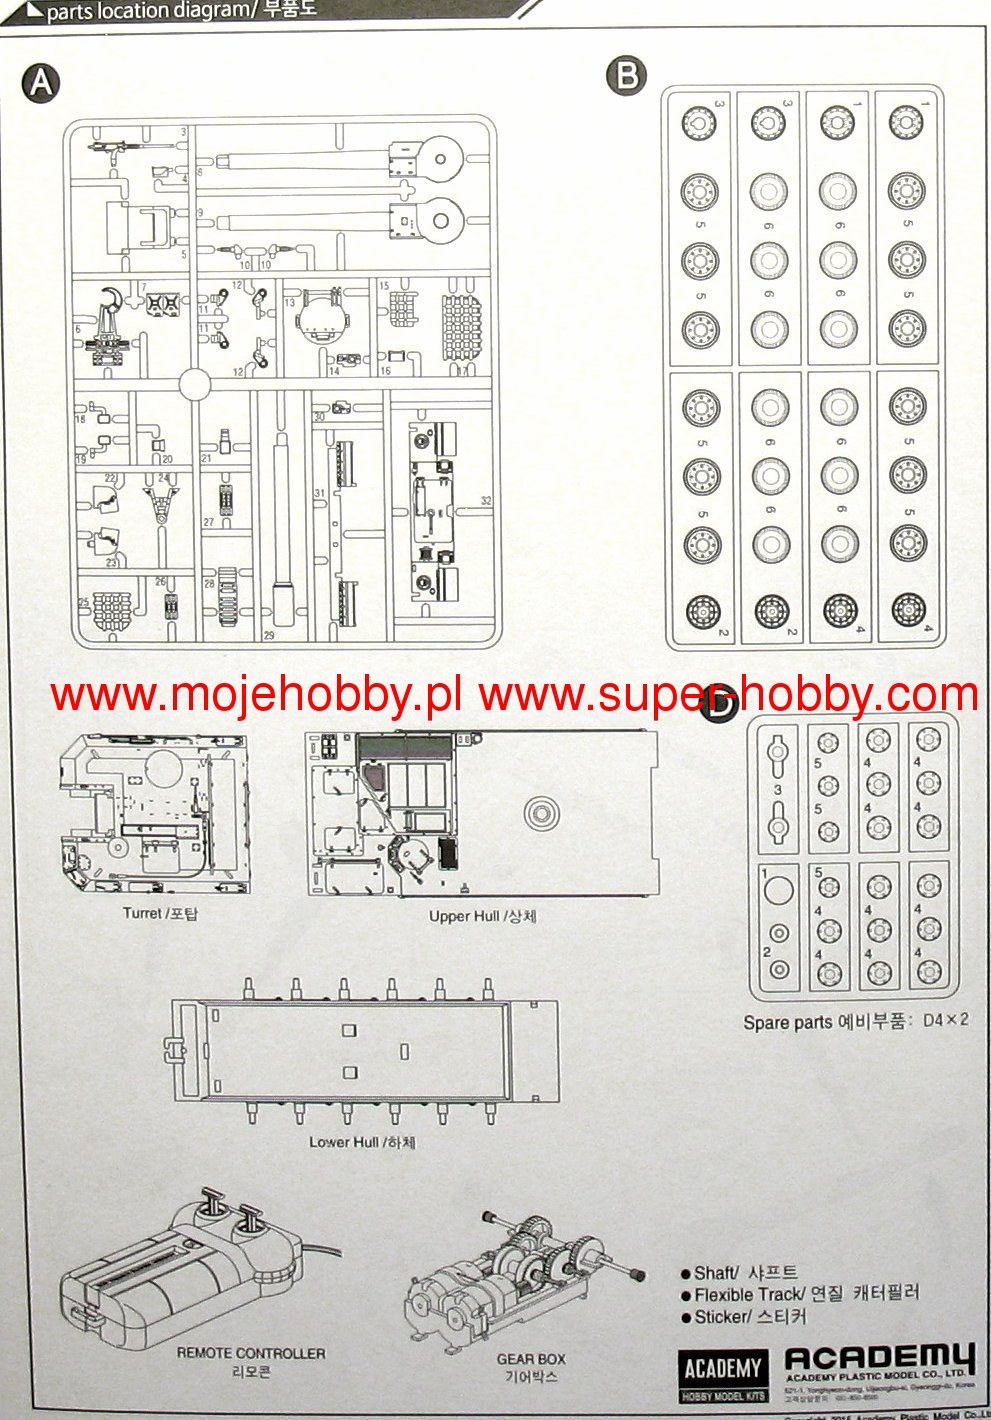 15295_2_aca13312_3_1 3 army k 9 wiring diagrams wiring diagrams  at eliteediting.co